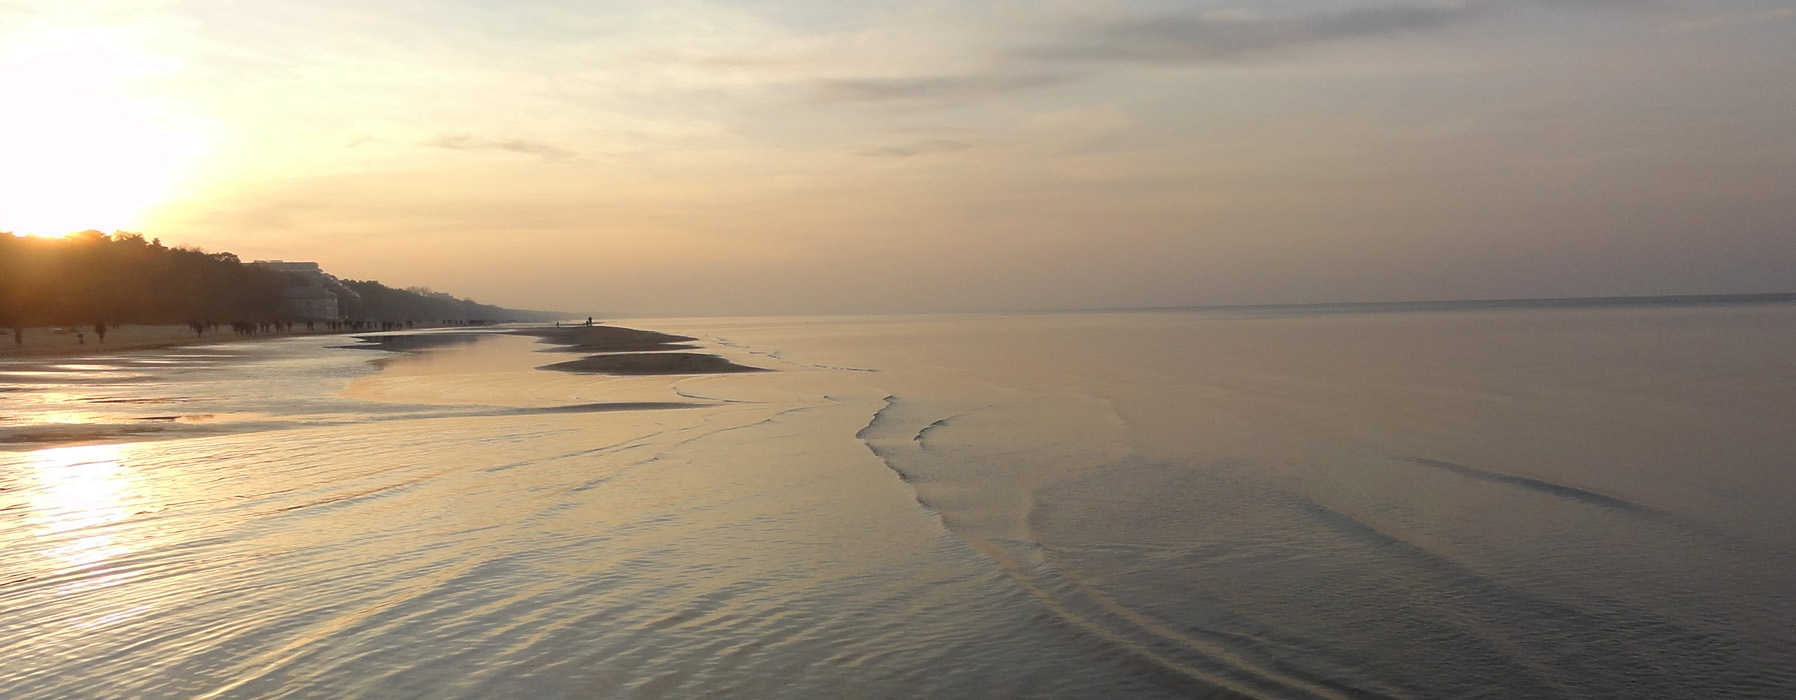 Балтийское море пейзажи природы художник Альберт Сафиуллин